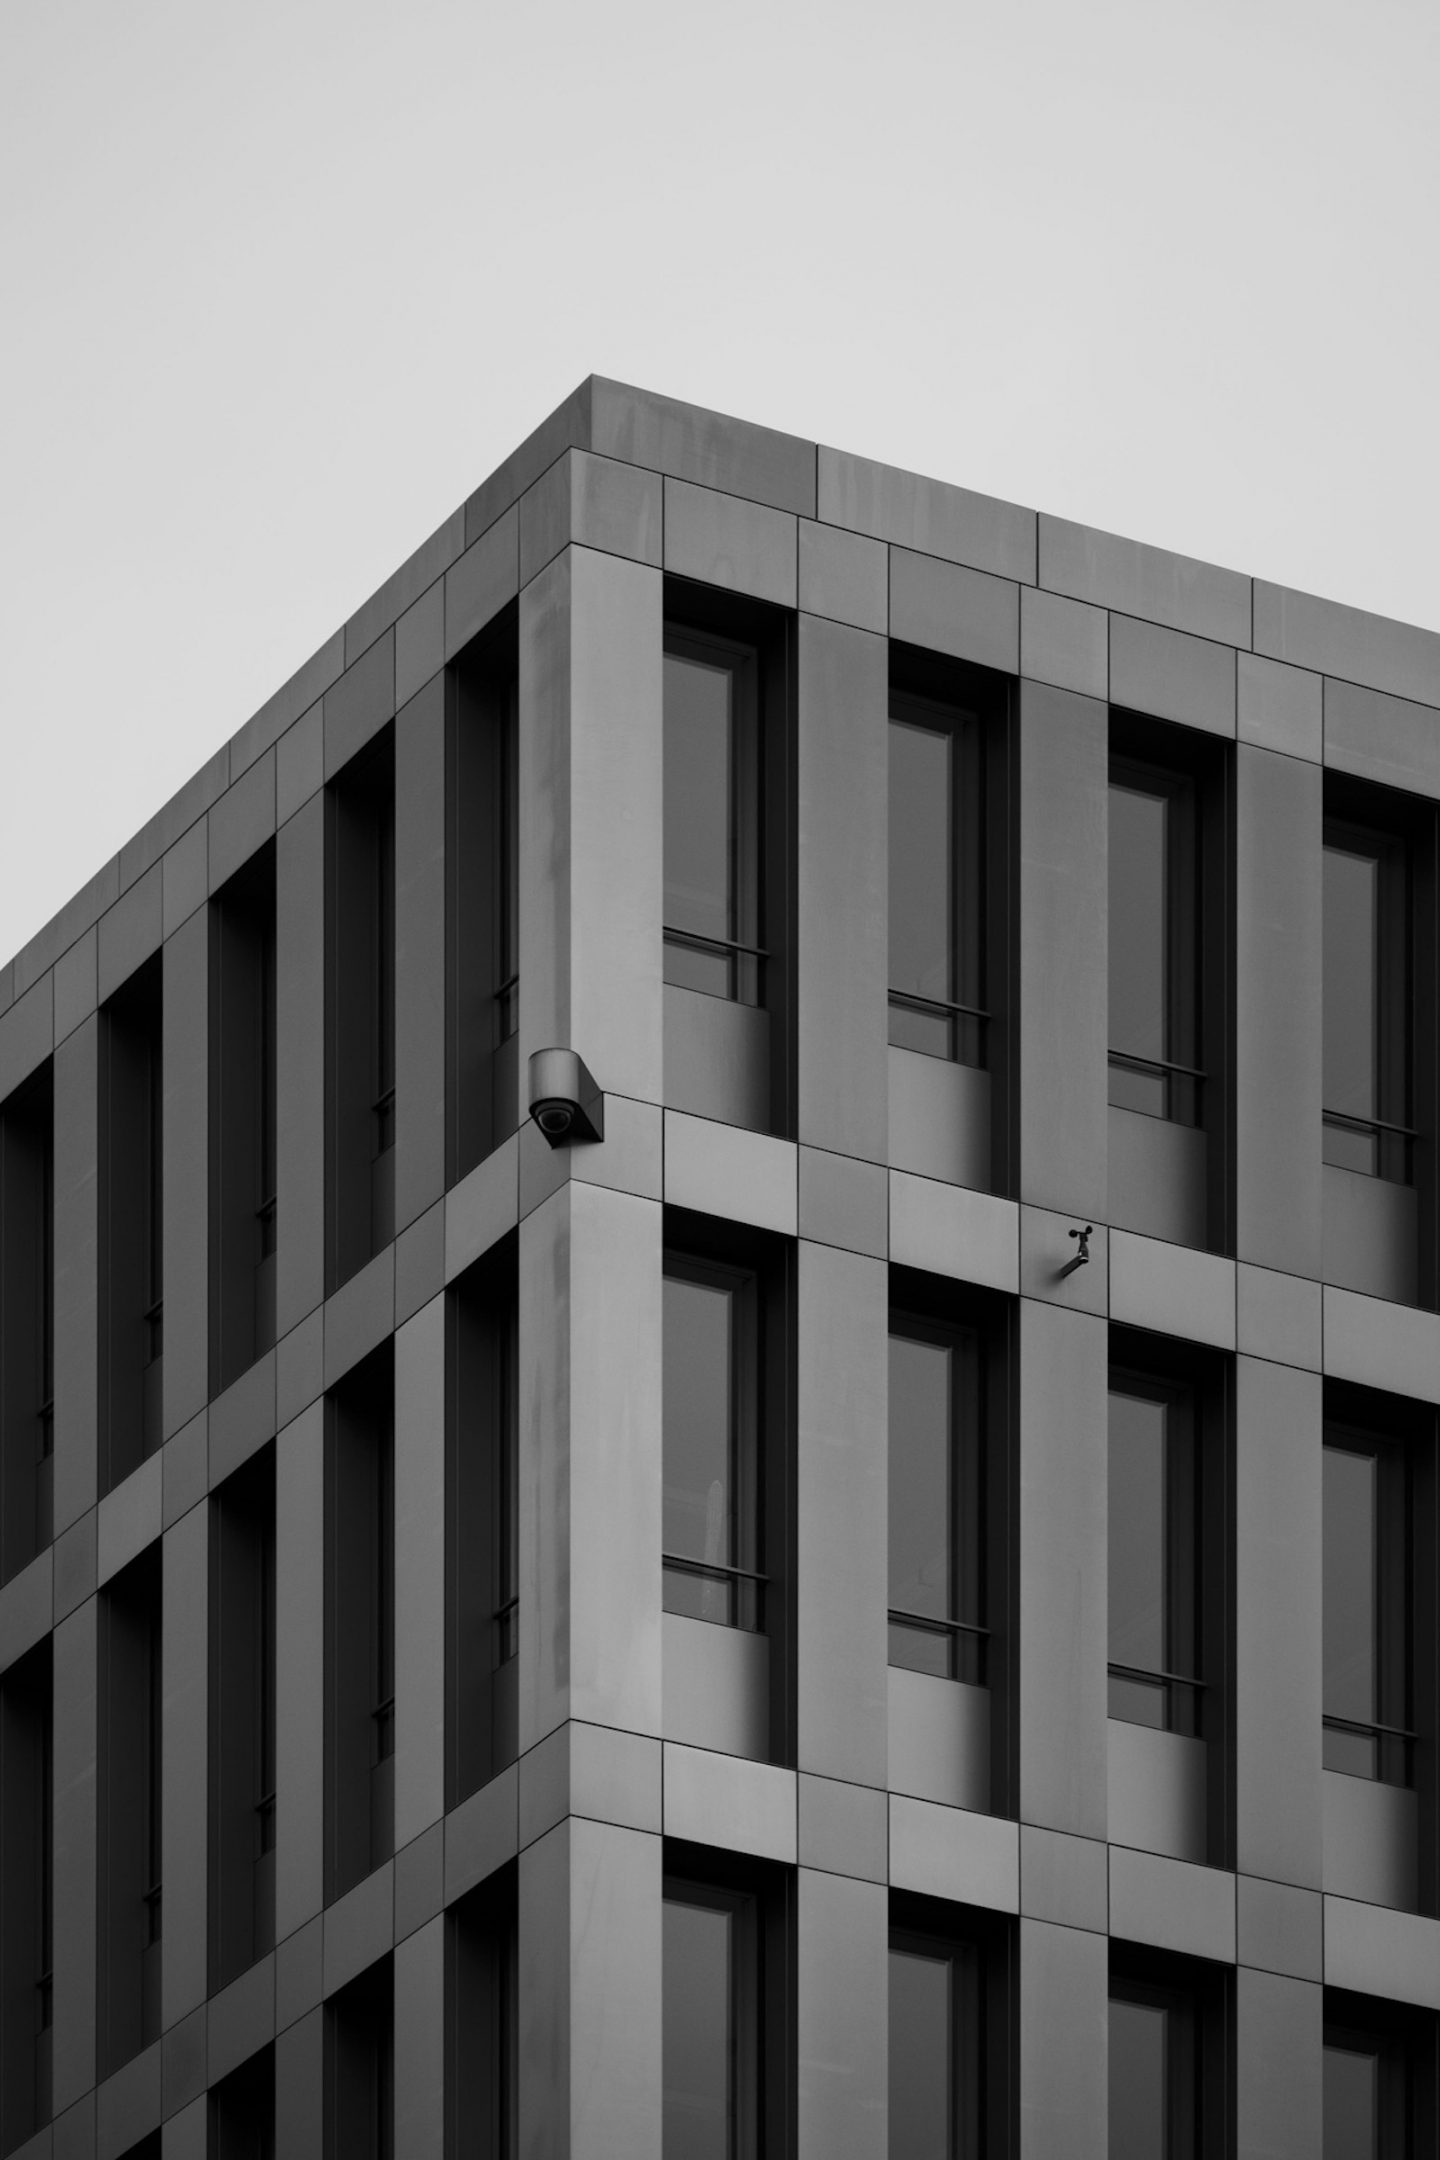 IGNANT-Photography-Michael-Gessner-Masse-3